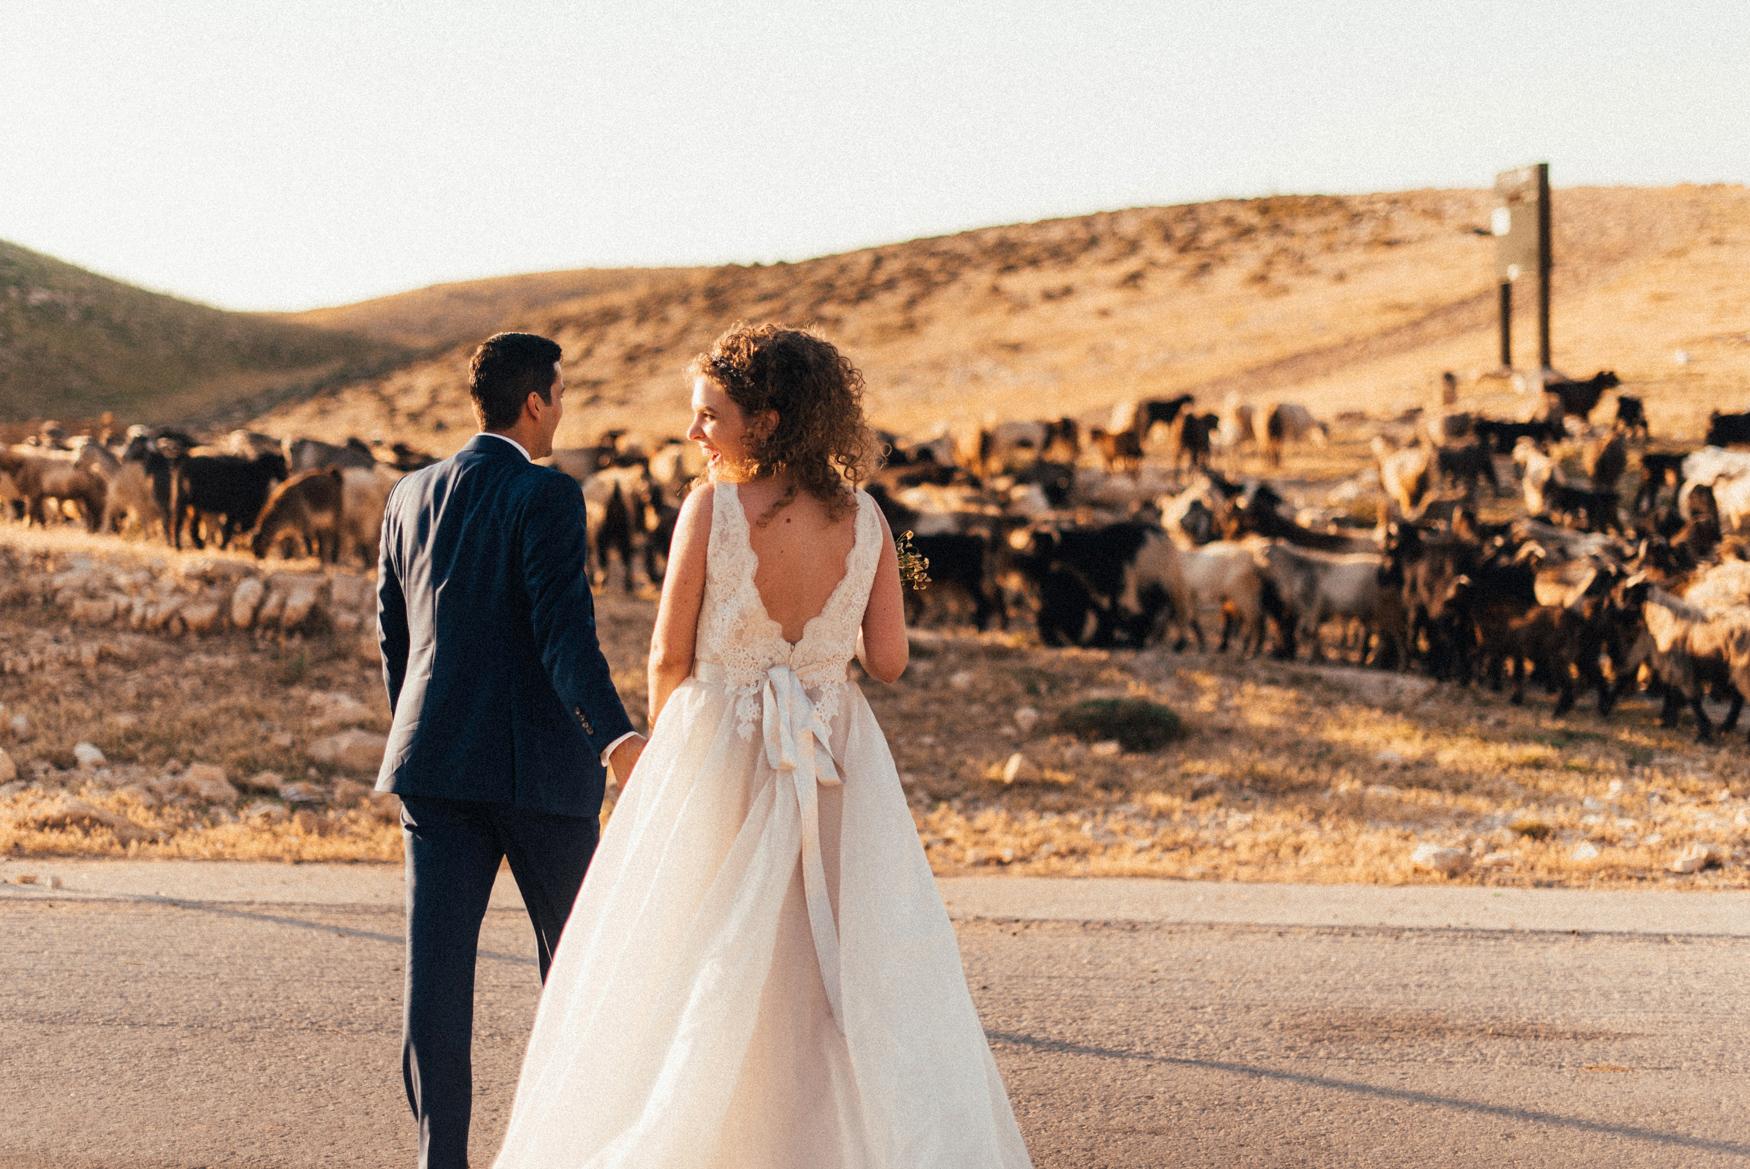 LR4 byblos beirut faraya wedding photographer portraits 012.jpg